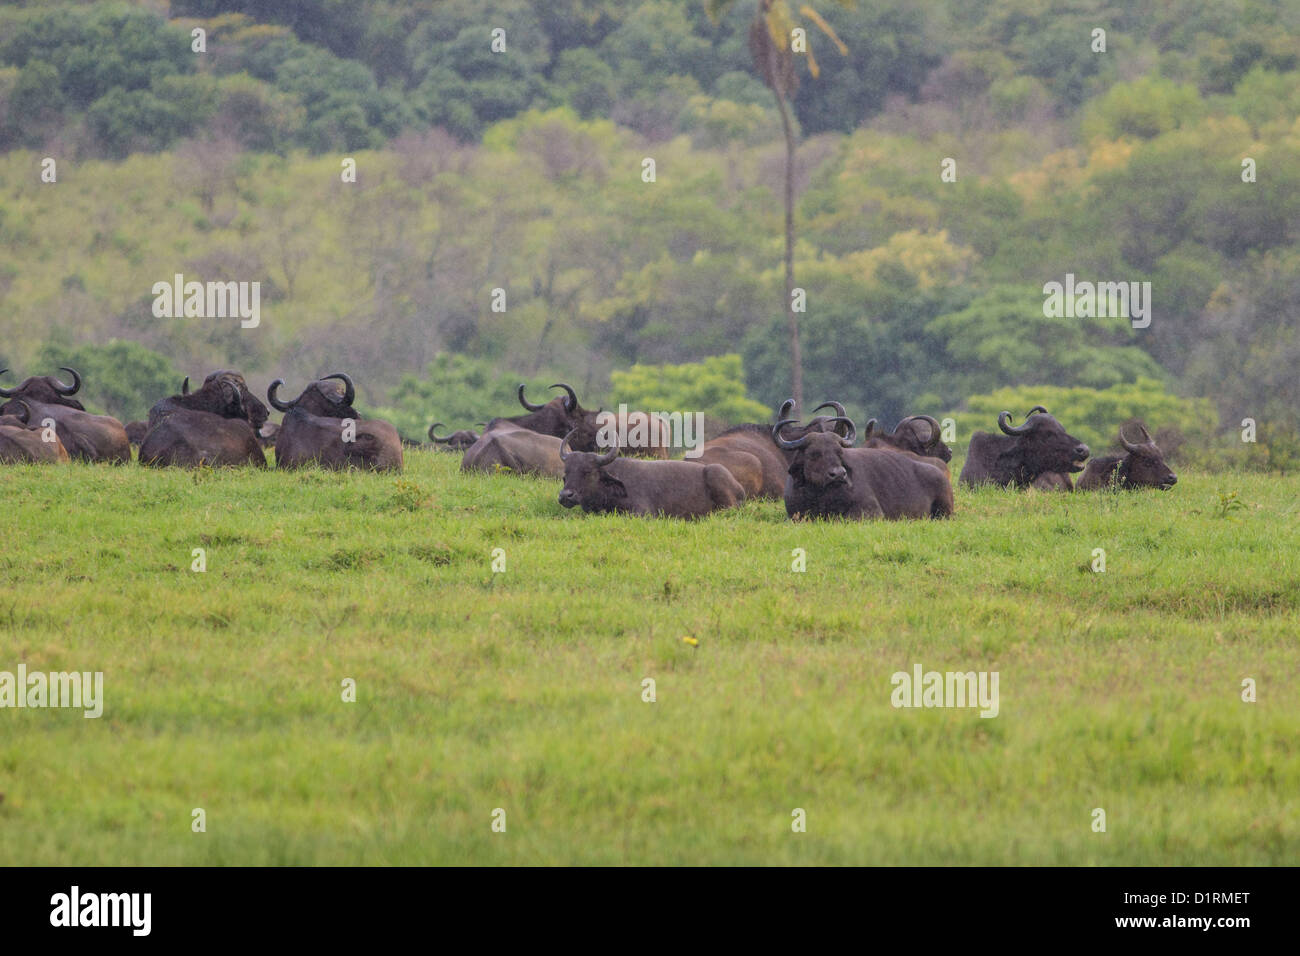 Buffalo, Arusha National Park, Tanzania, East Africa - Stock Image